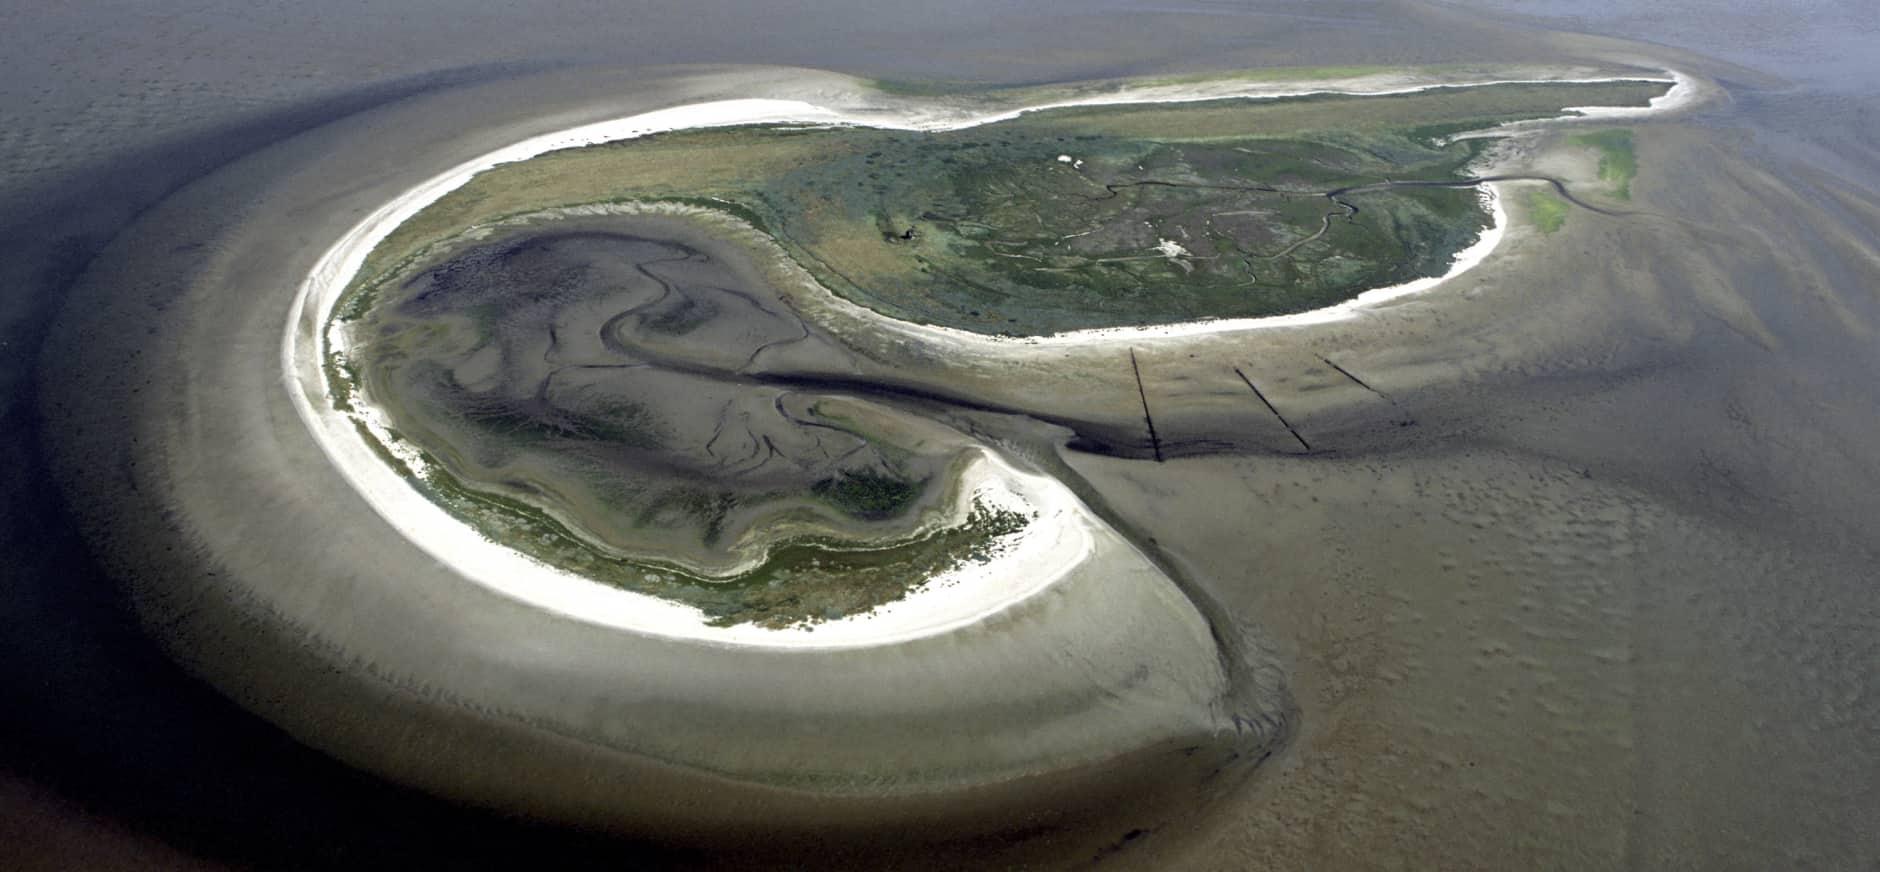 Griend eerste Nederlandse natuurgebied in Google Street View